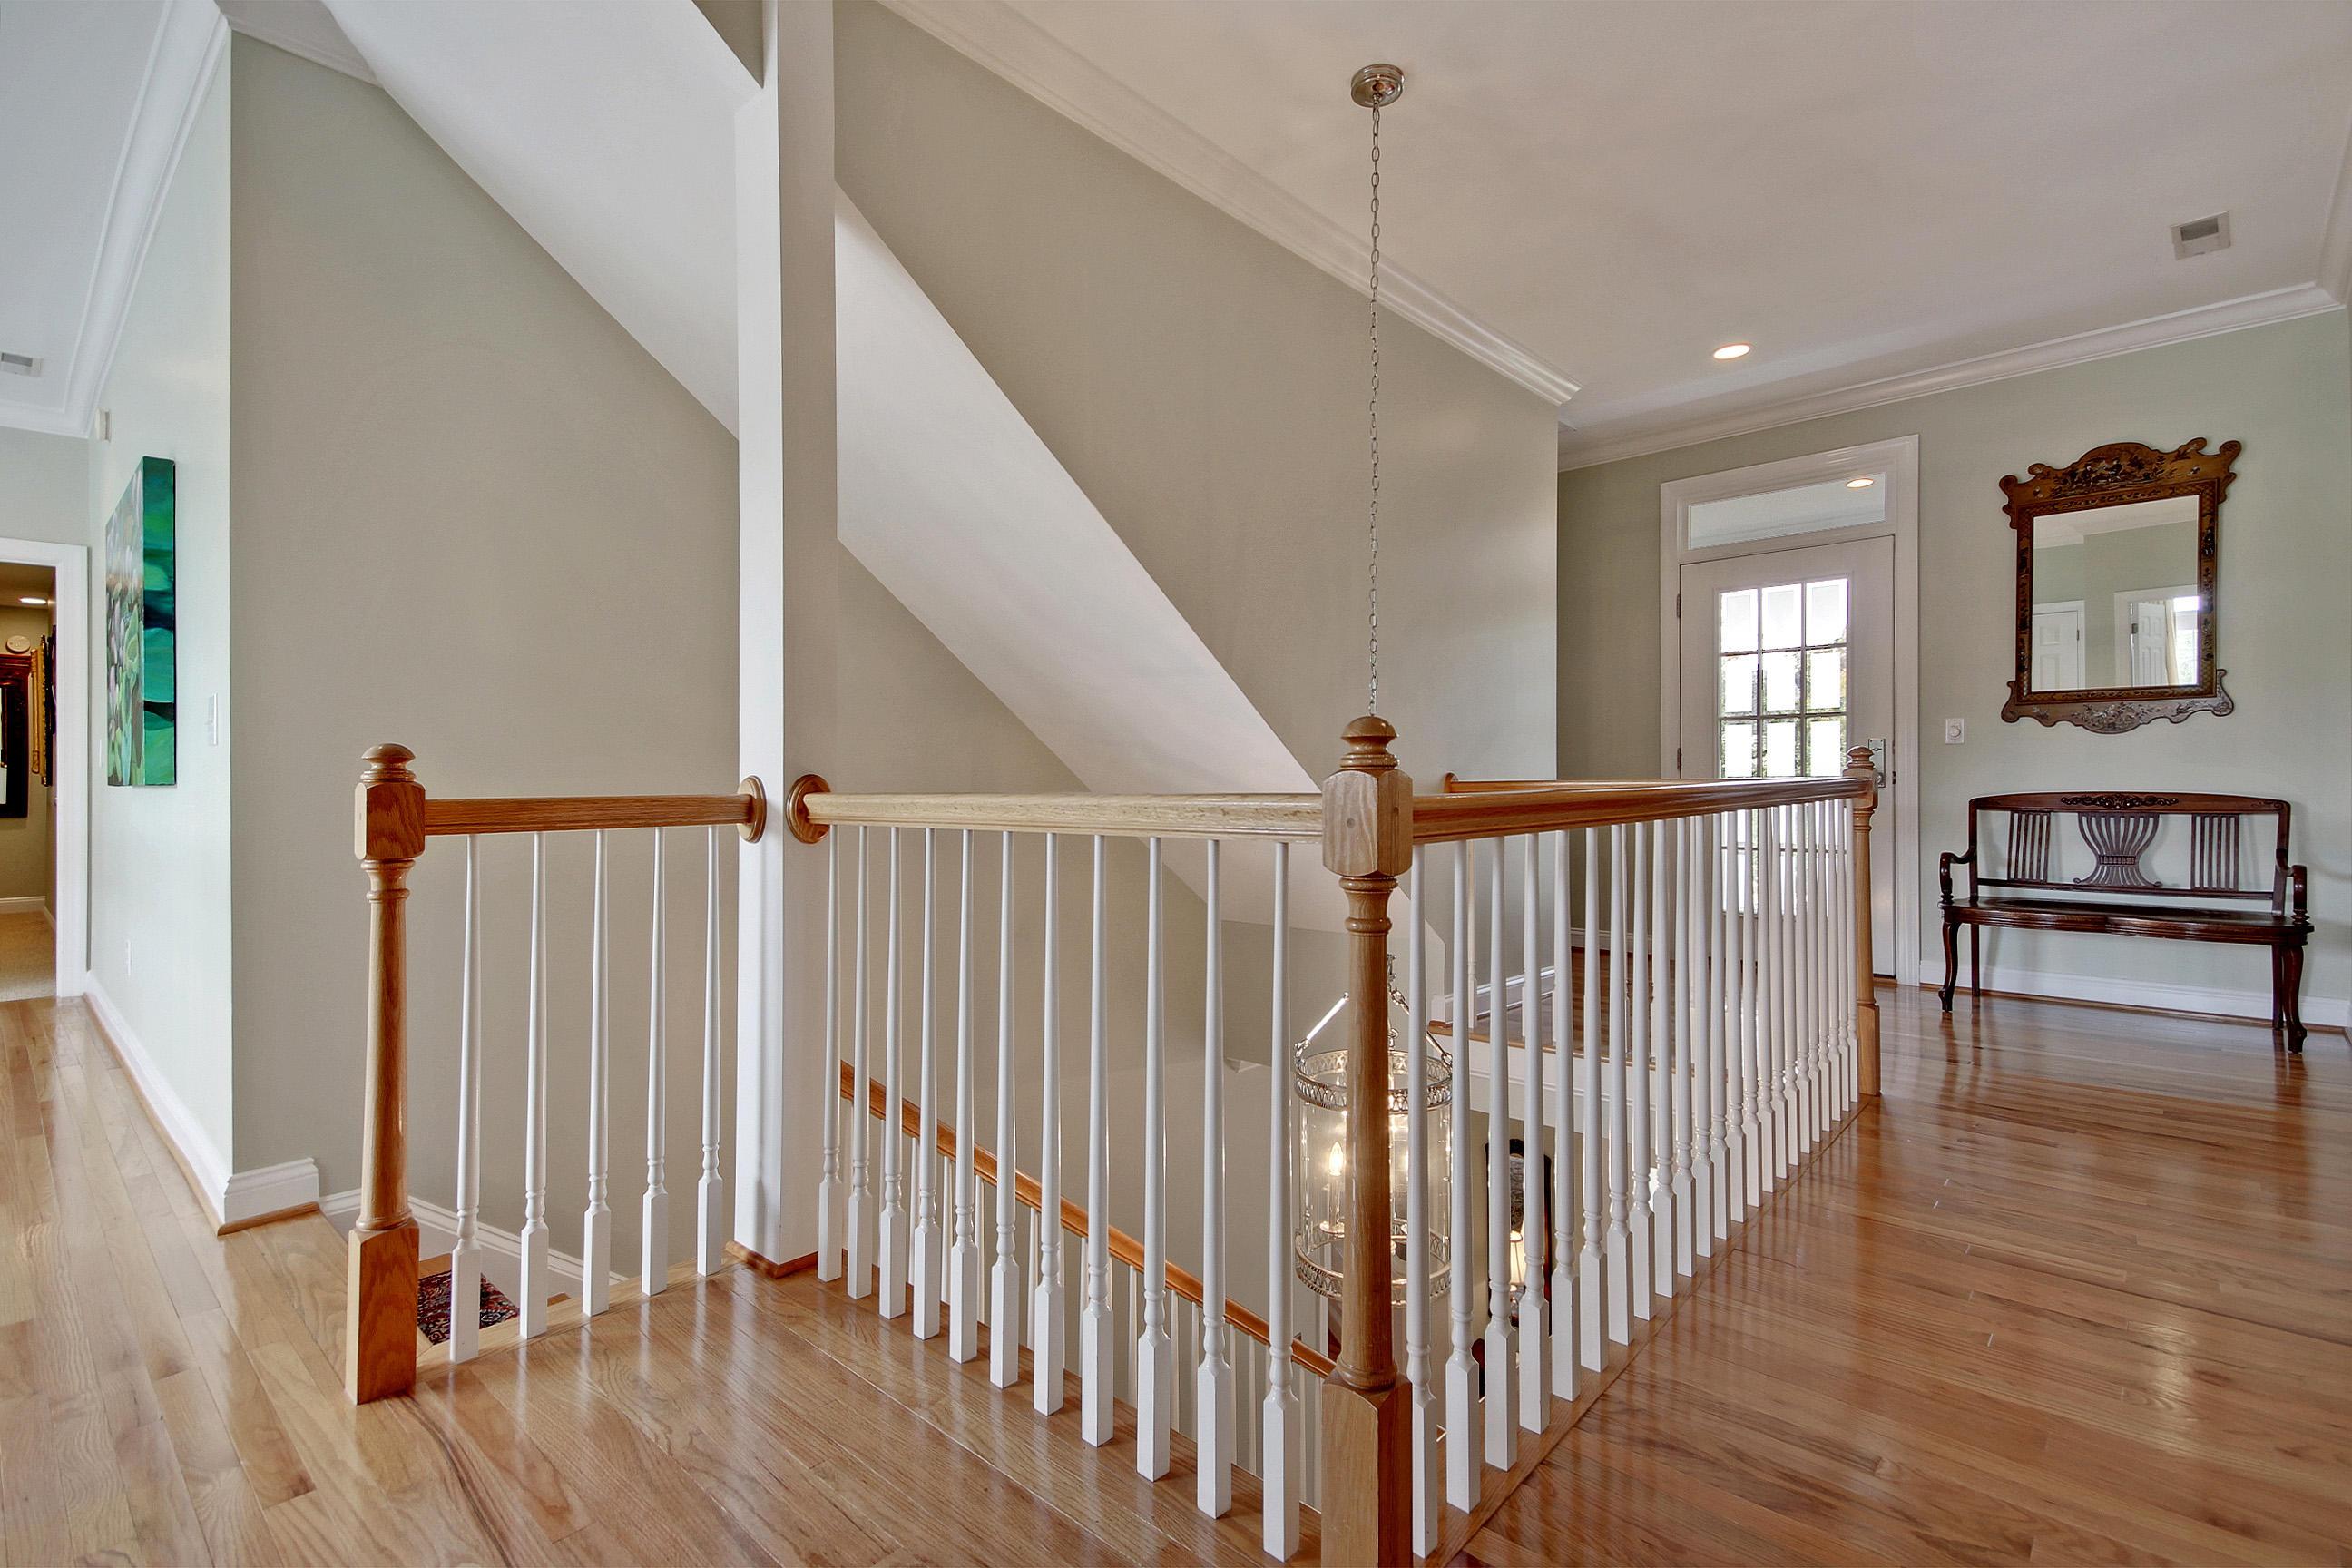 Dunes West Homes For Sale - 2364 Darts Cove, Mount Pleasant, SC - 17